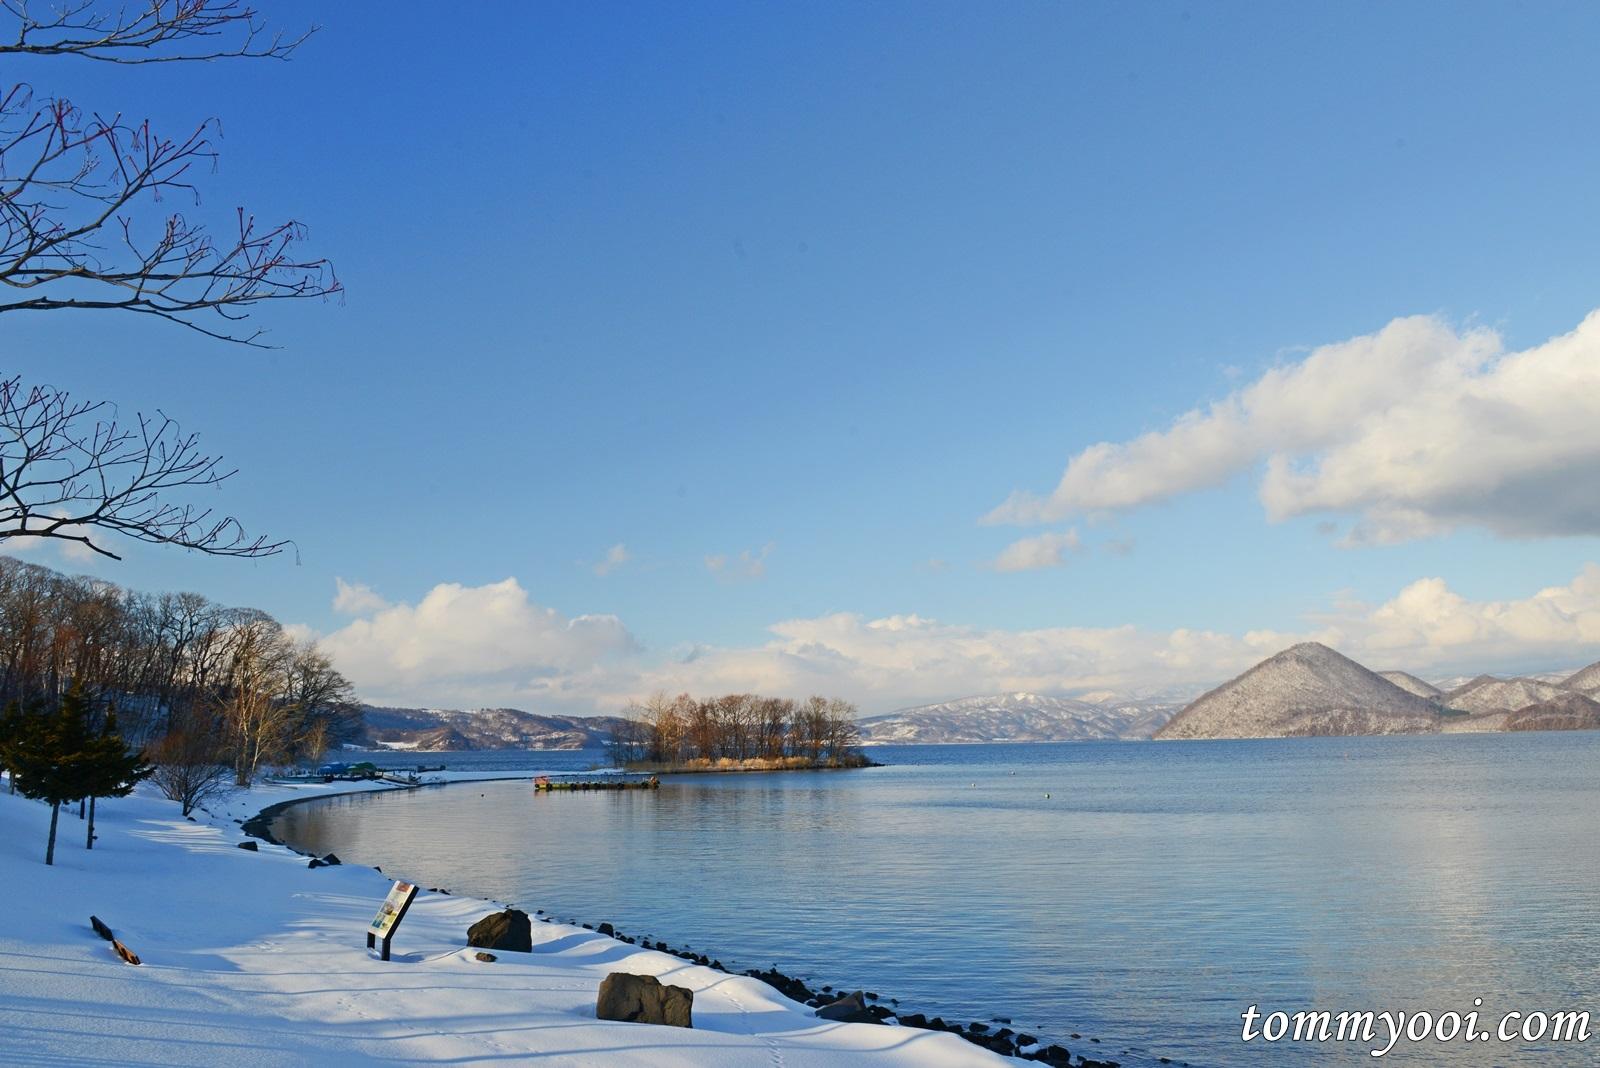 11 Days 9 Nights Hokkaido Self Drive Trip Lake Toya